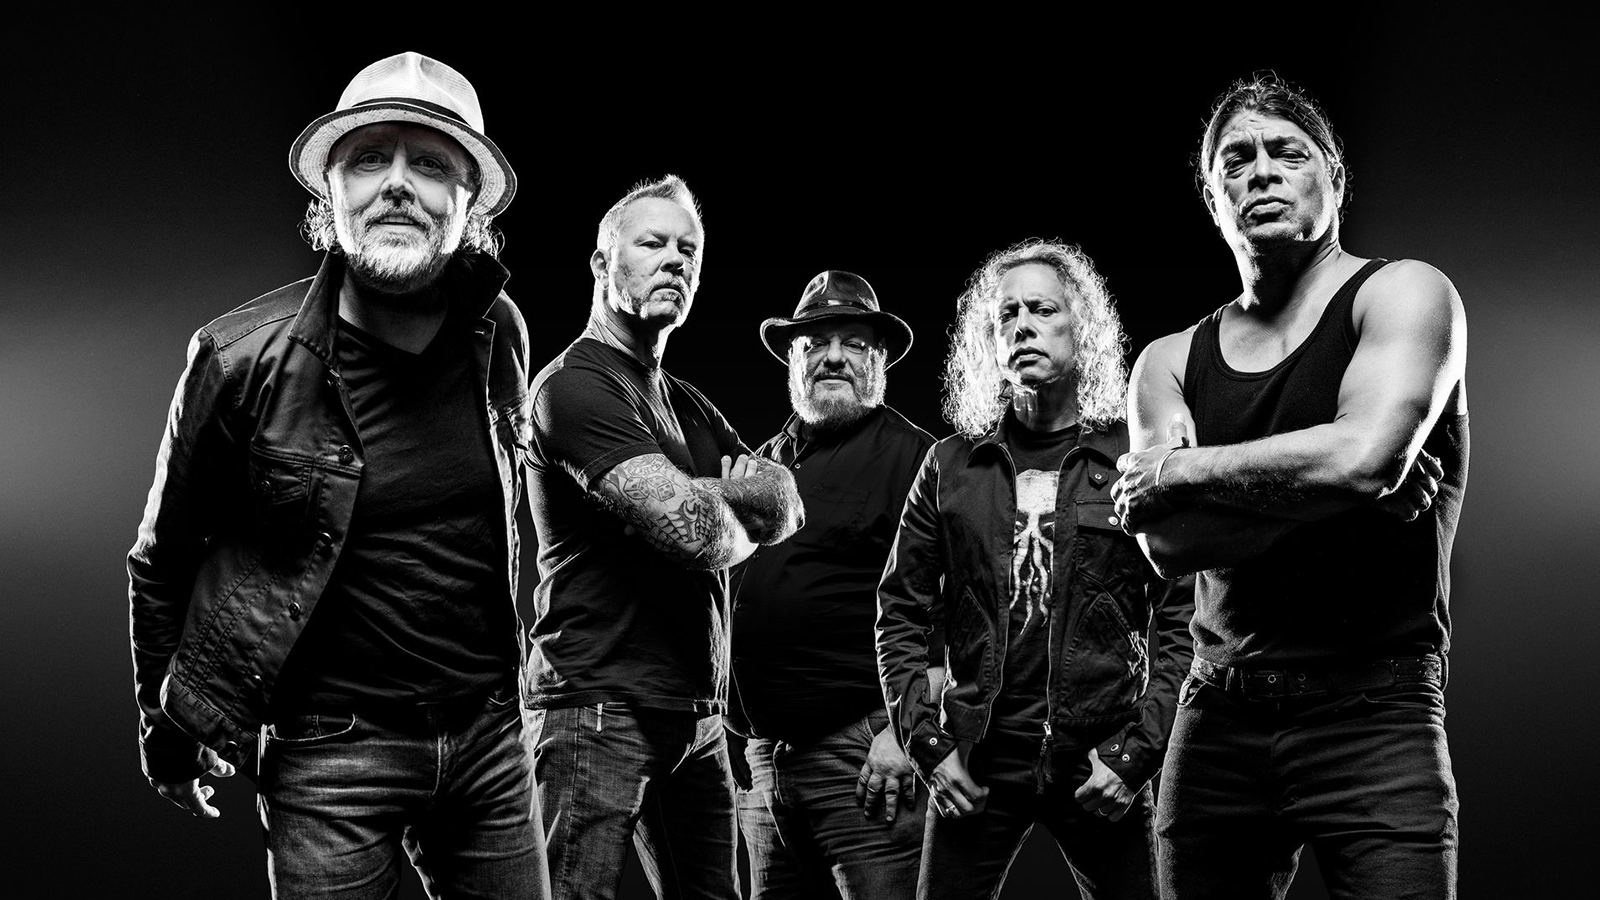 Raise Your Horn: Dave Pickerell on Secret Behind Metallica ...